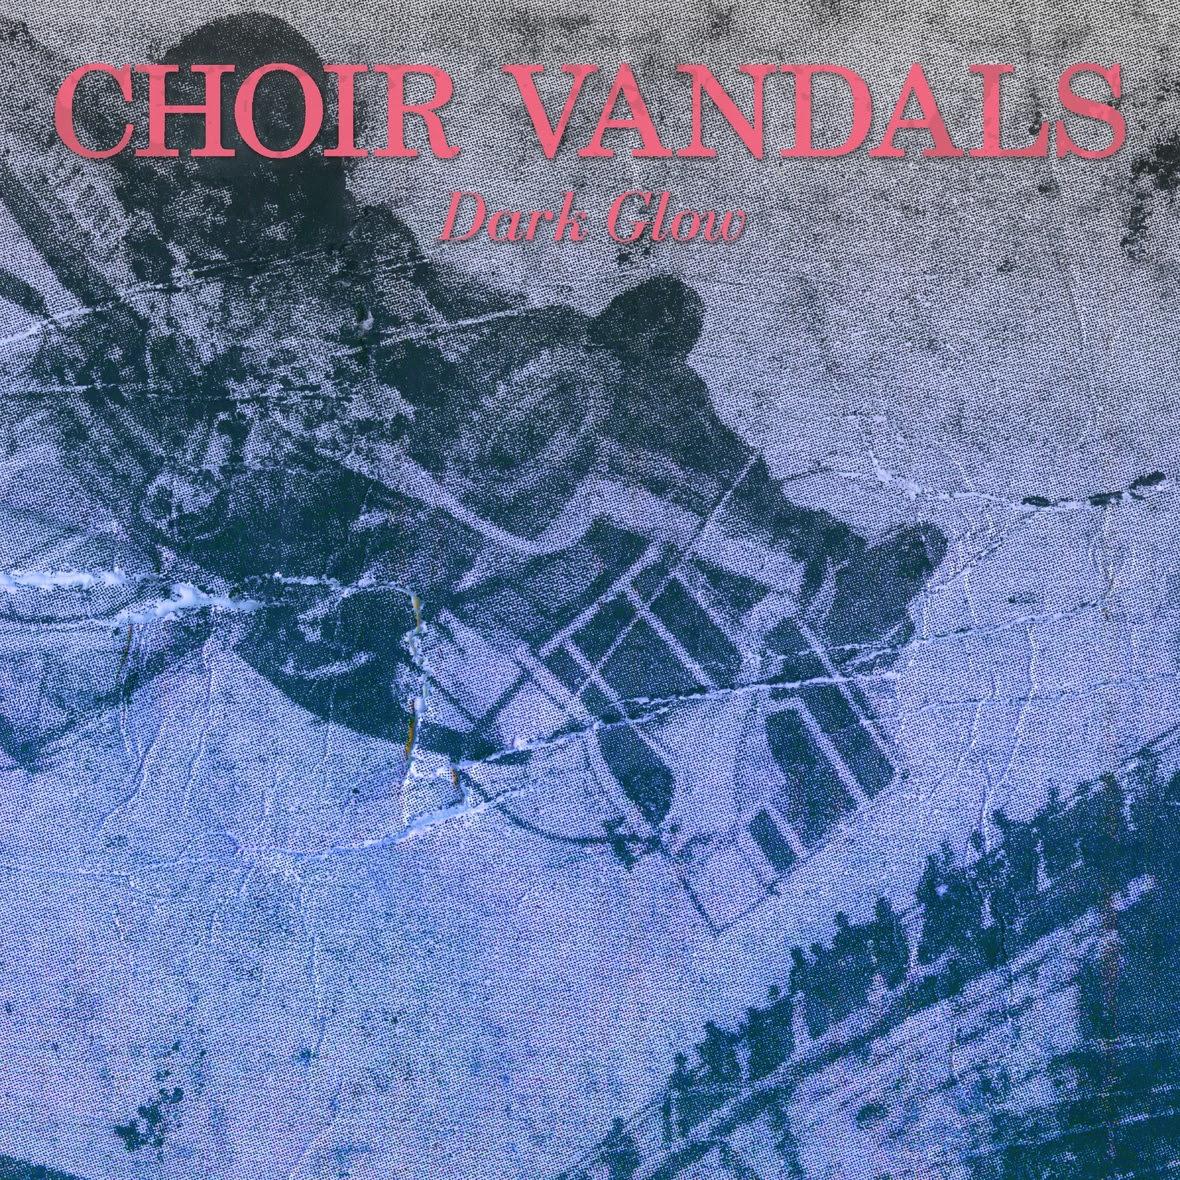 Choir Vandals - Dark Glow - Cover